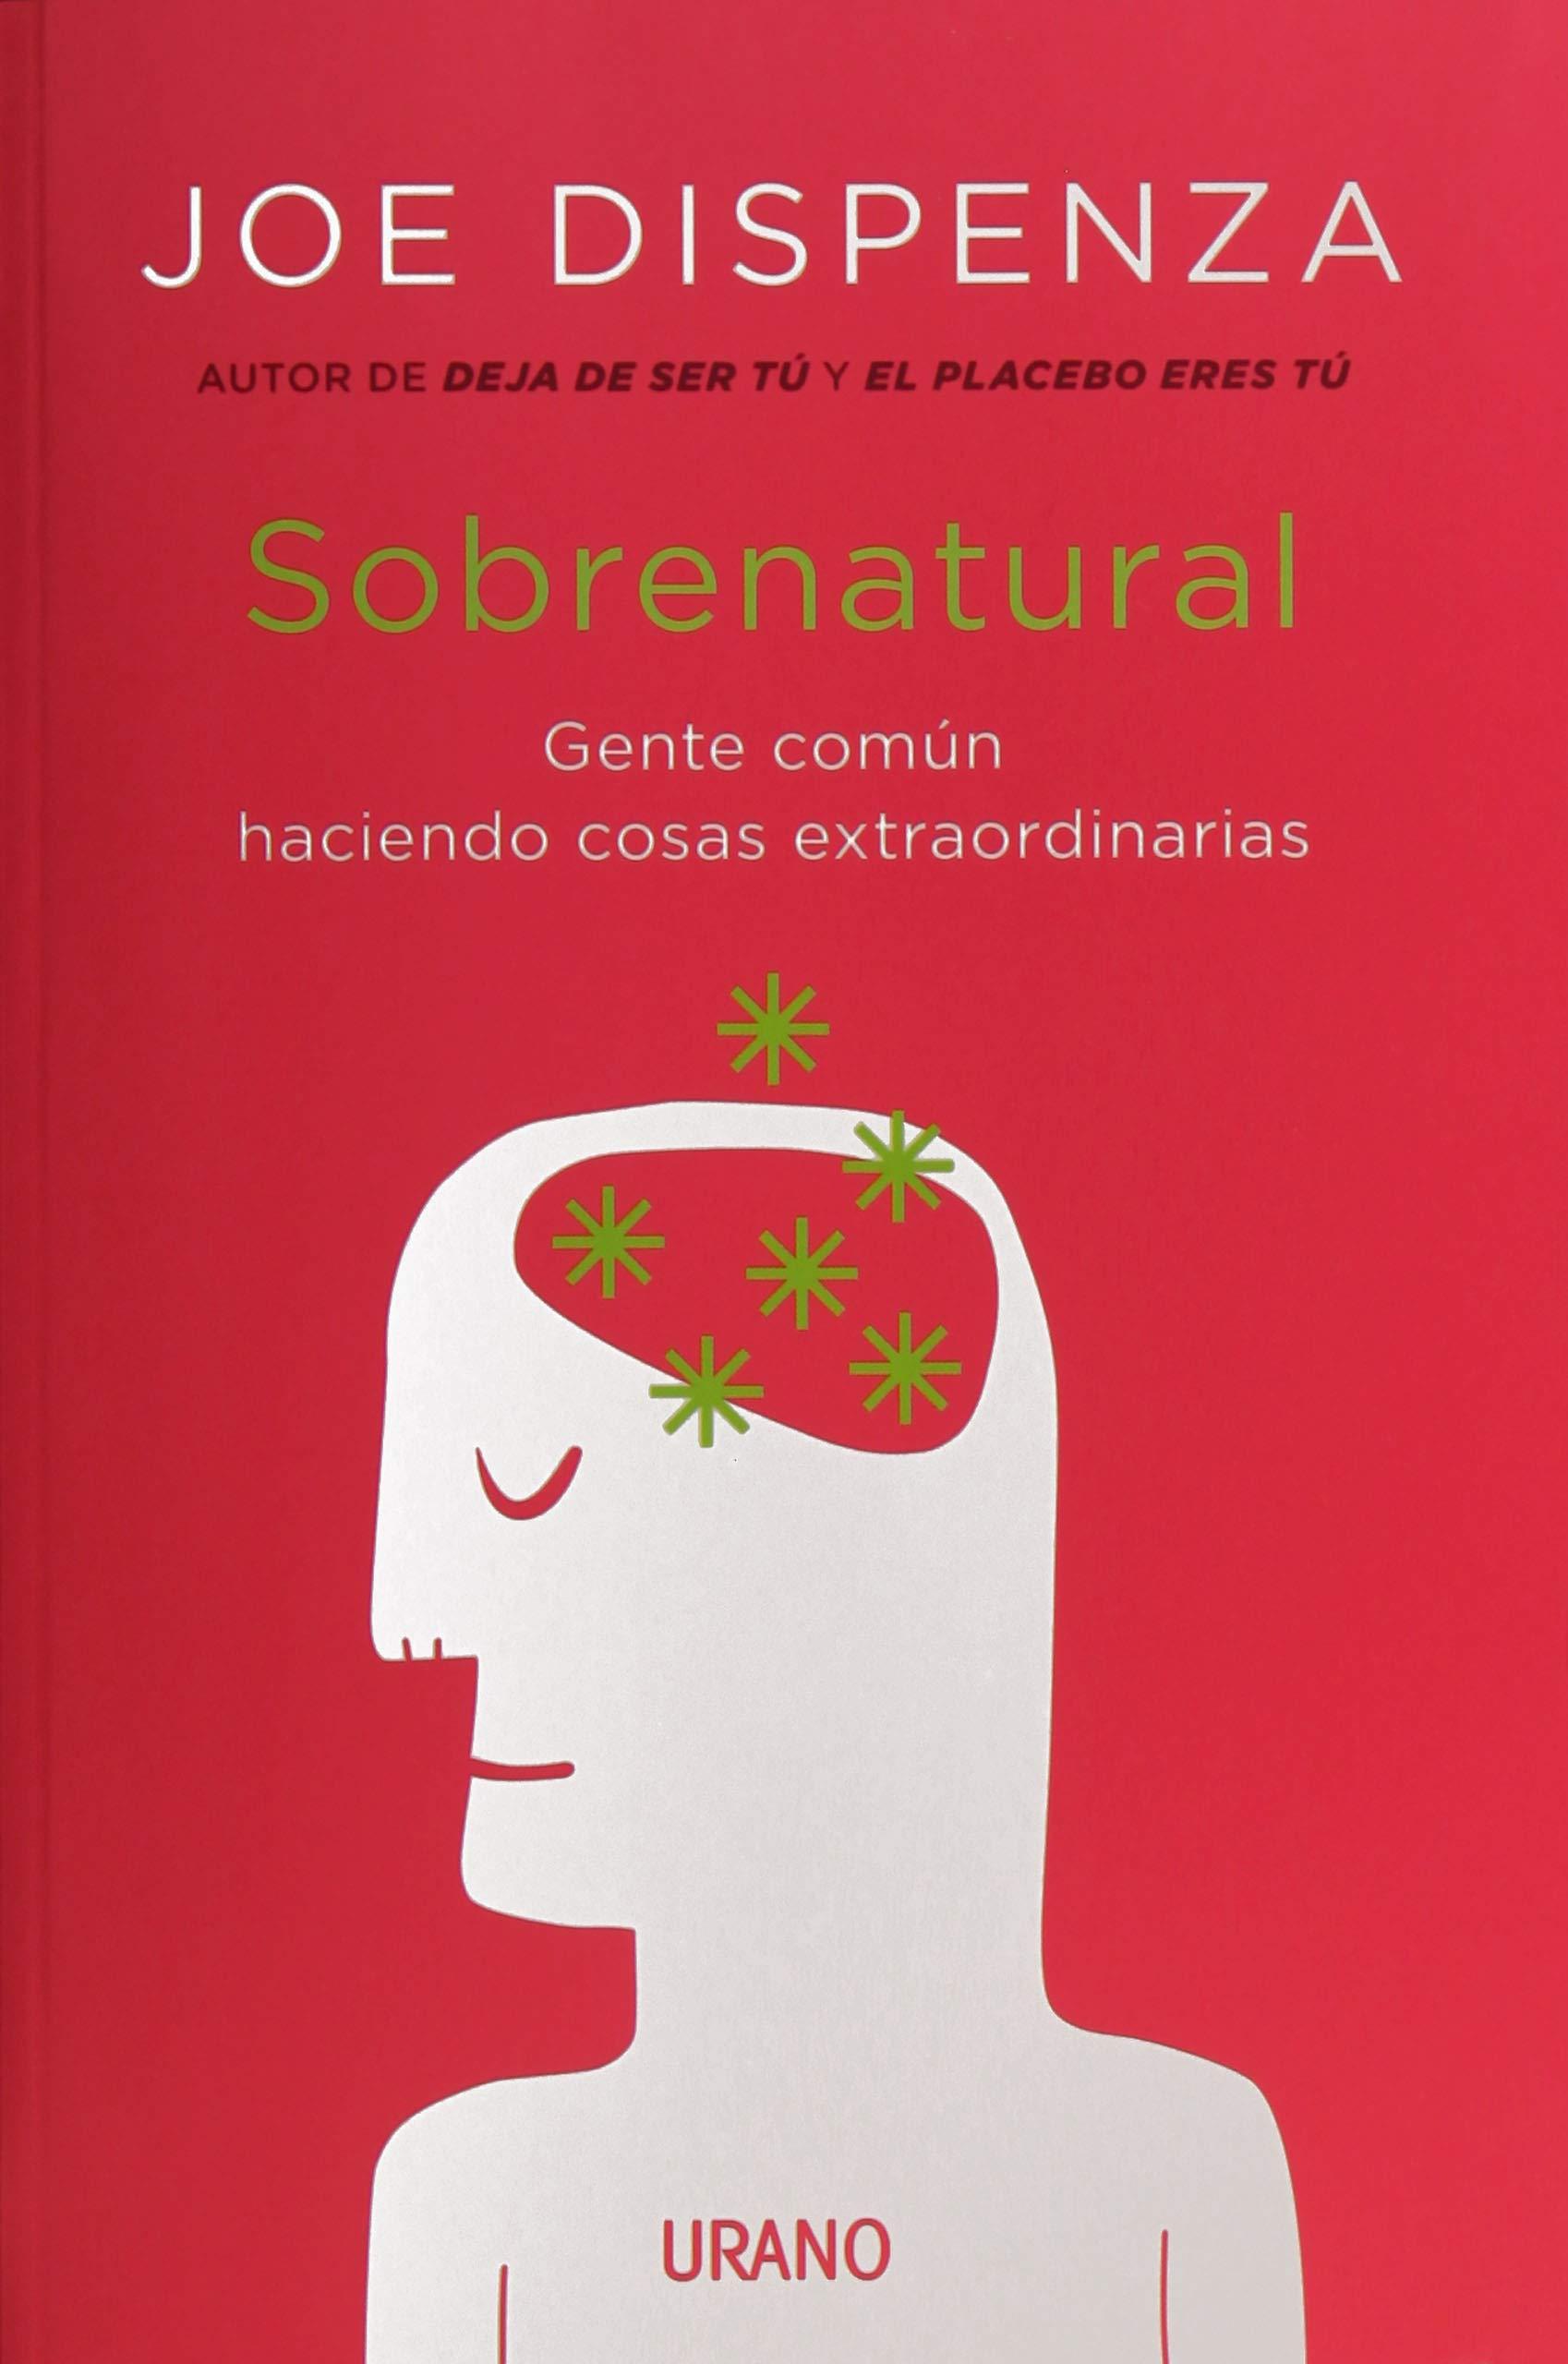 Sobrenatural: Dispenza, Joe: 9786077481676: Amazon.com: Books